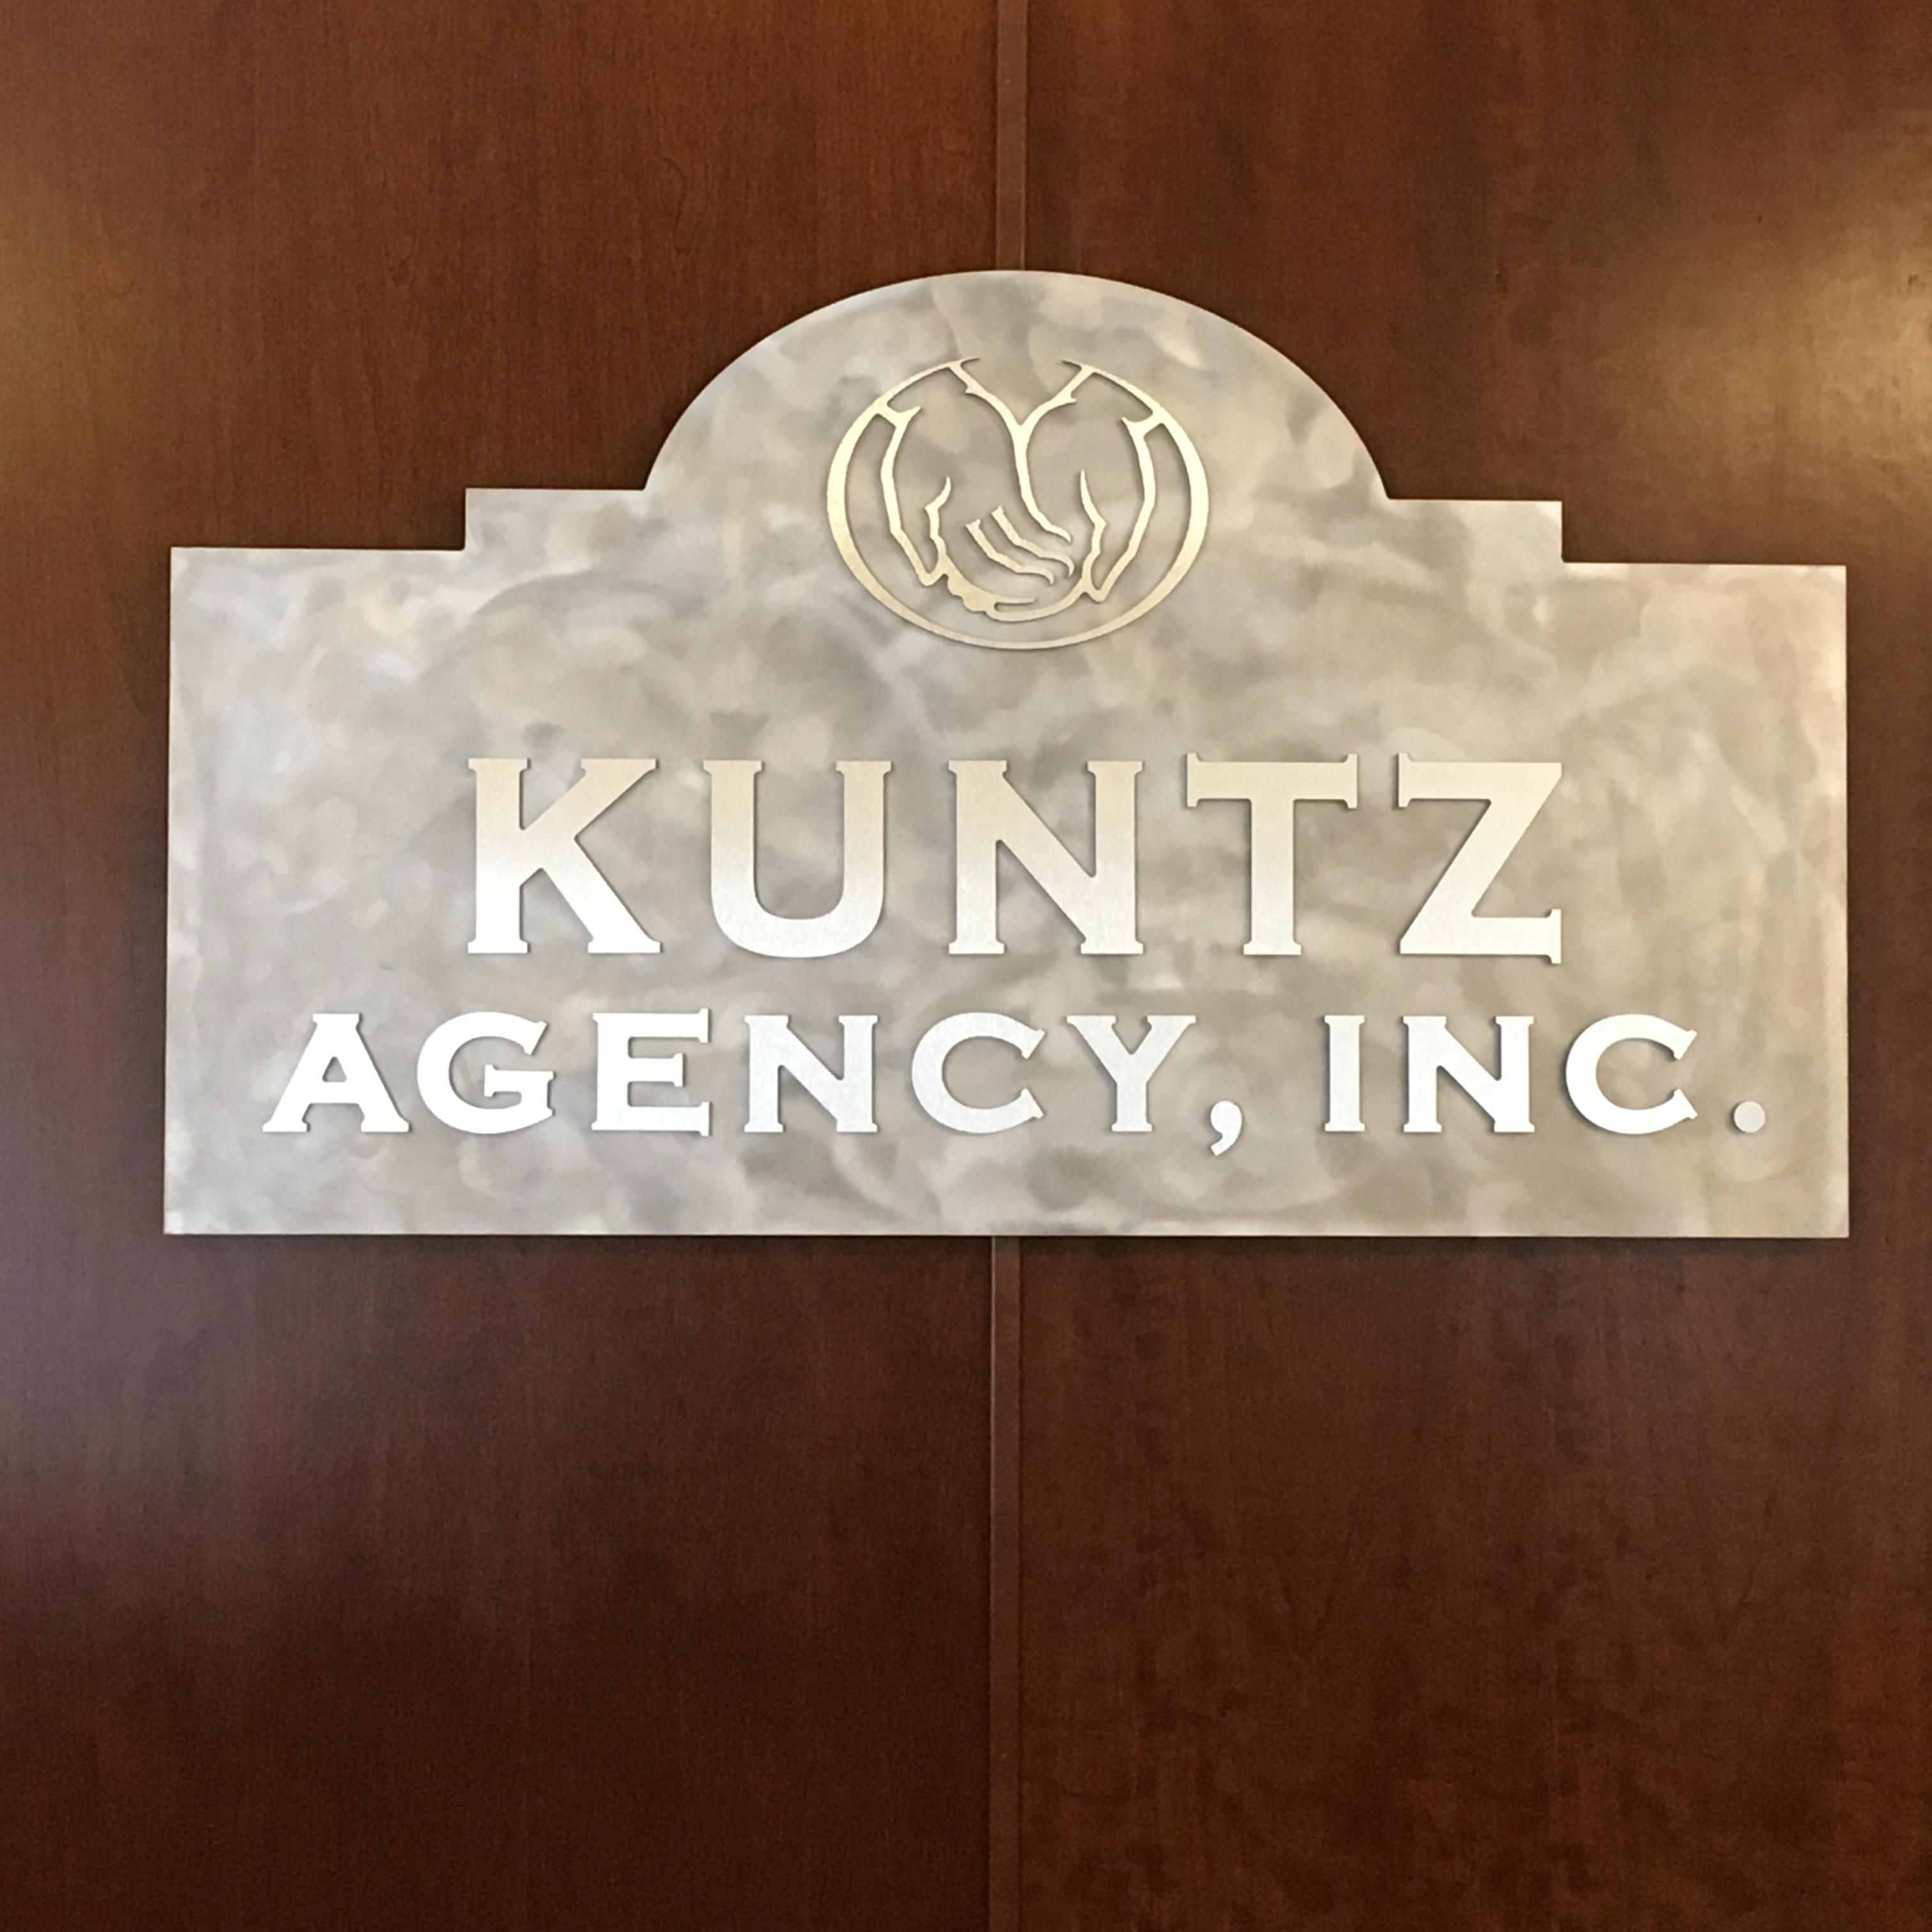 Allstate Insurance Agent: Dennis L. Kuntz image 1